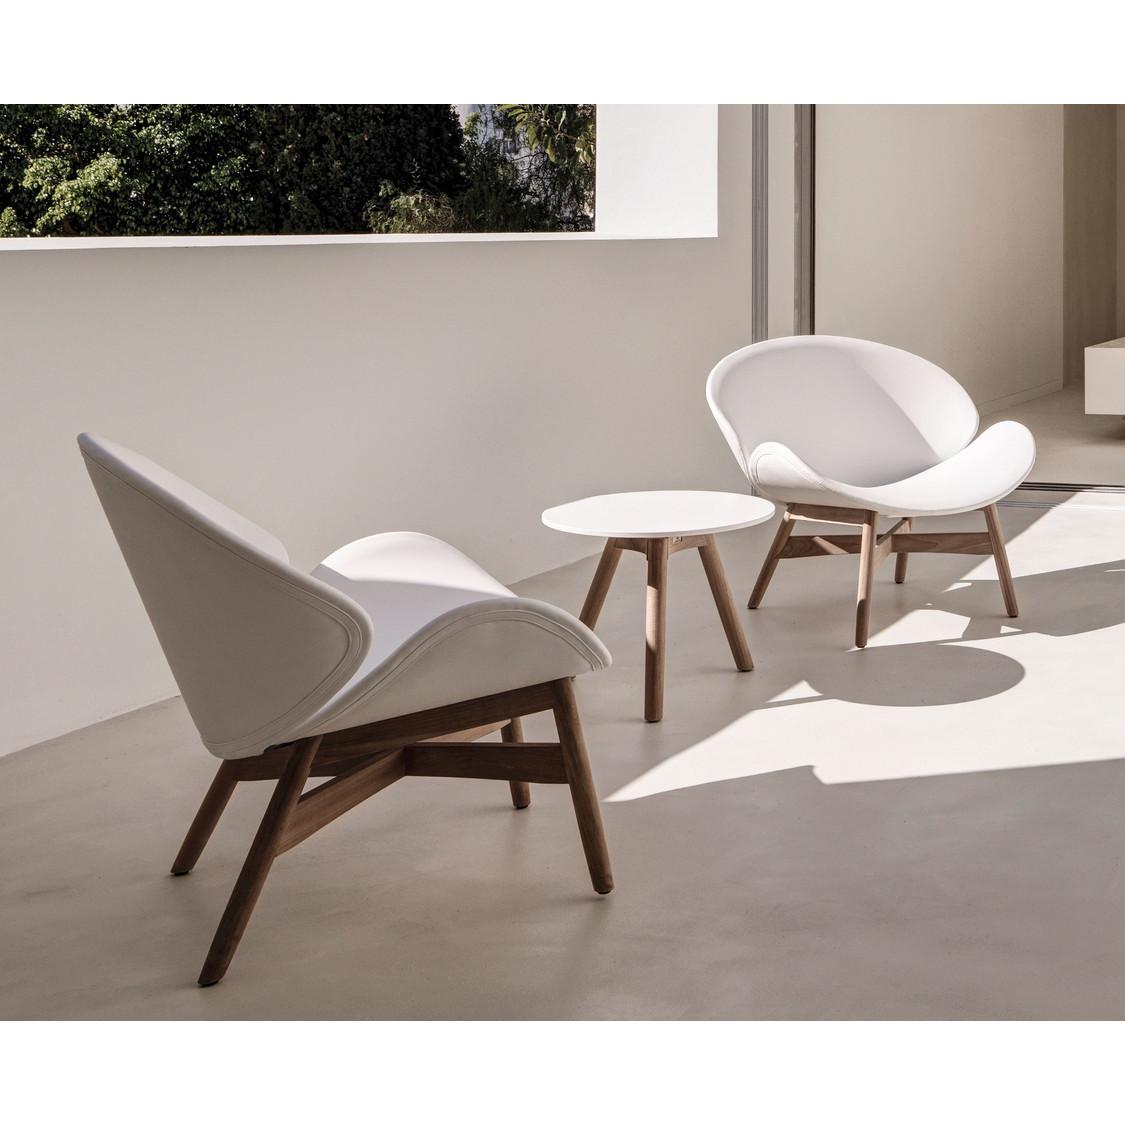 Garten Lounge Sessel Dansk, Gloster - Gloster